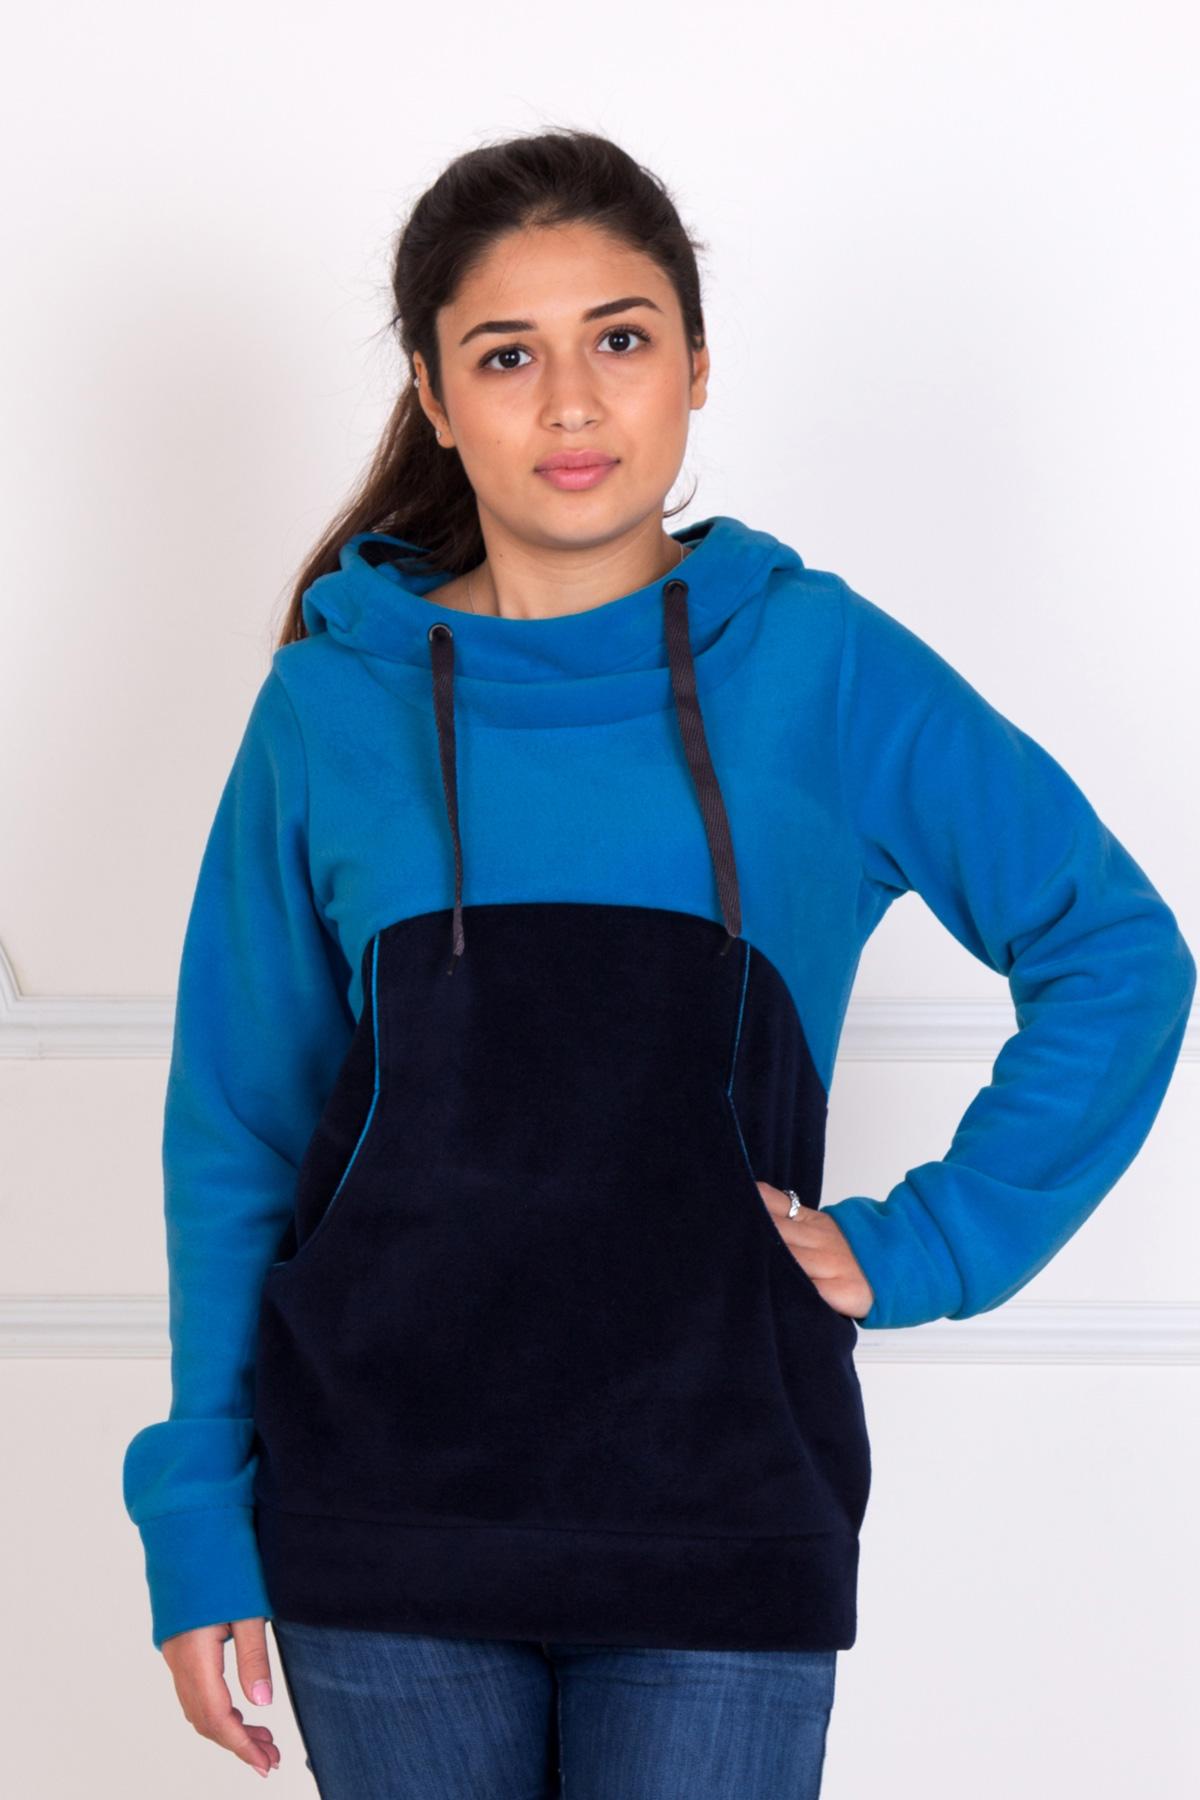 Жен. толстовка  Свитшот  Голубой р. 54 - Женская одежда артикул: 33221